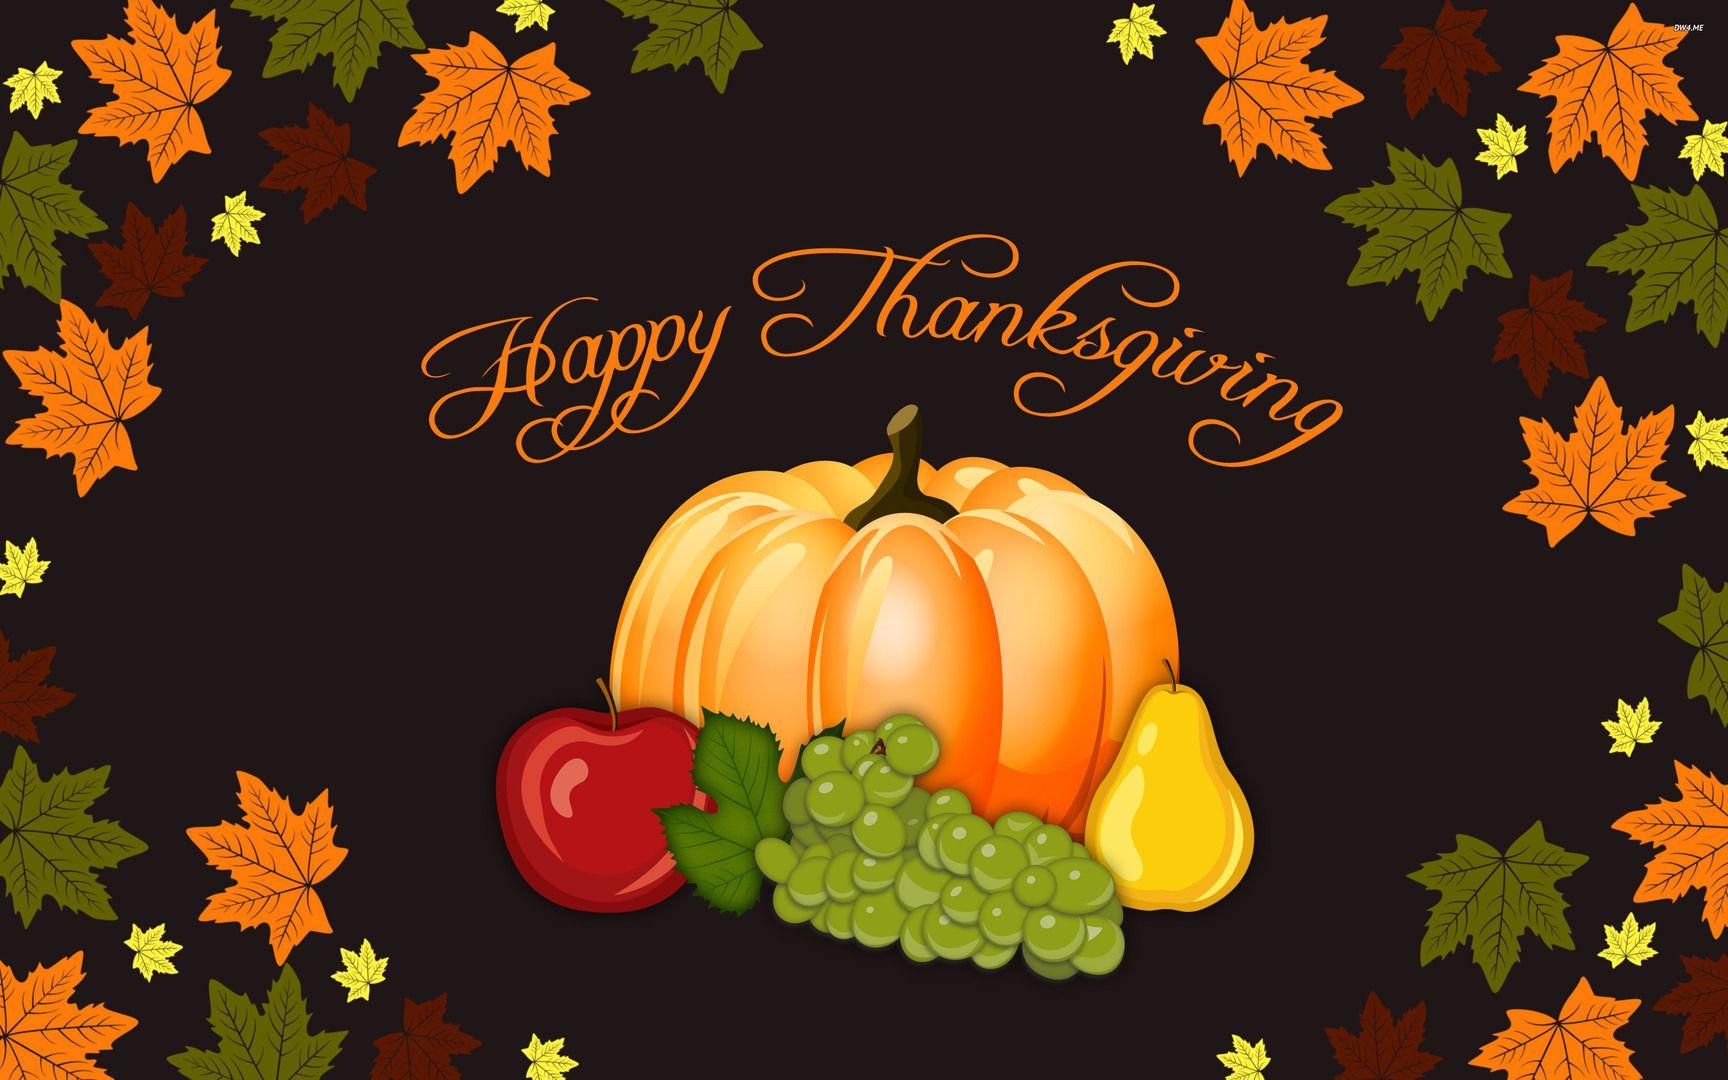 Happy thanksgiving wallpaper hd wallpaper thanksgiving